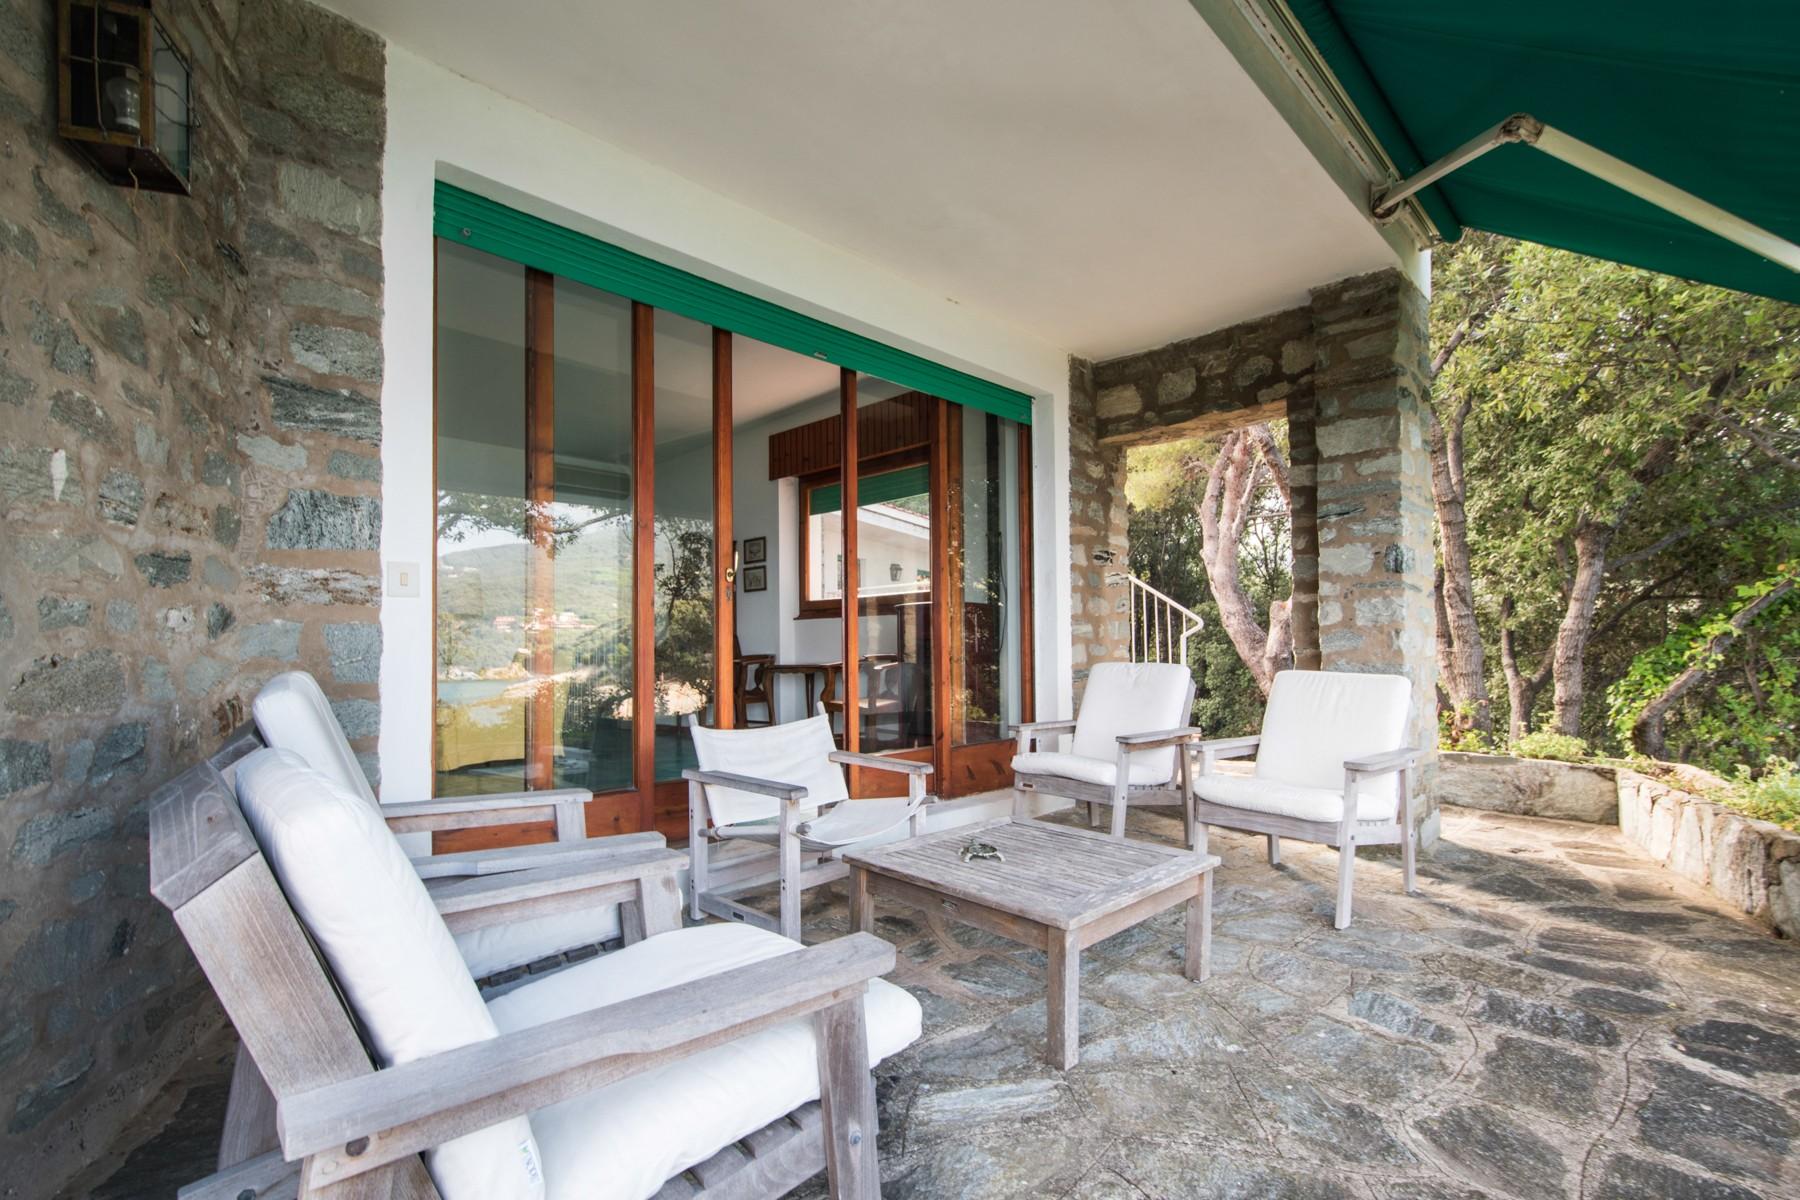 Villa in Vendita a Marciana: 5 locali, 300 mq - Foto 4